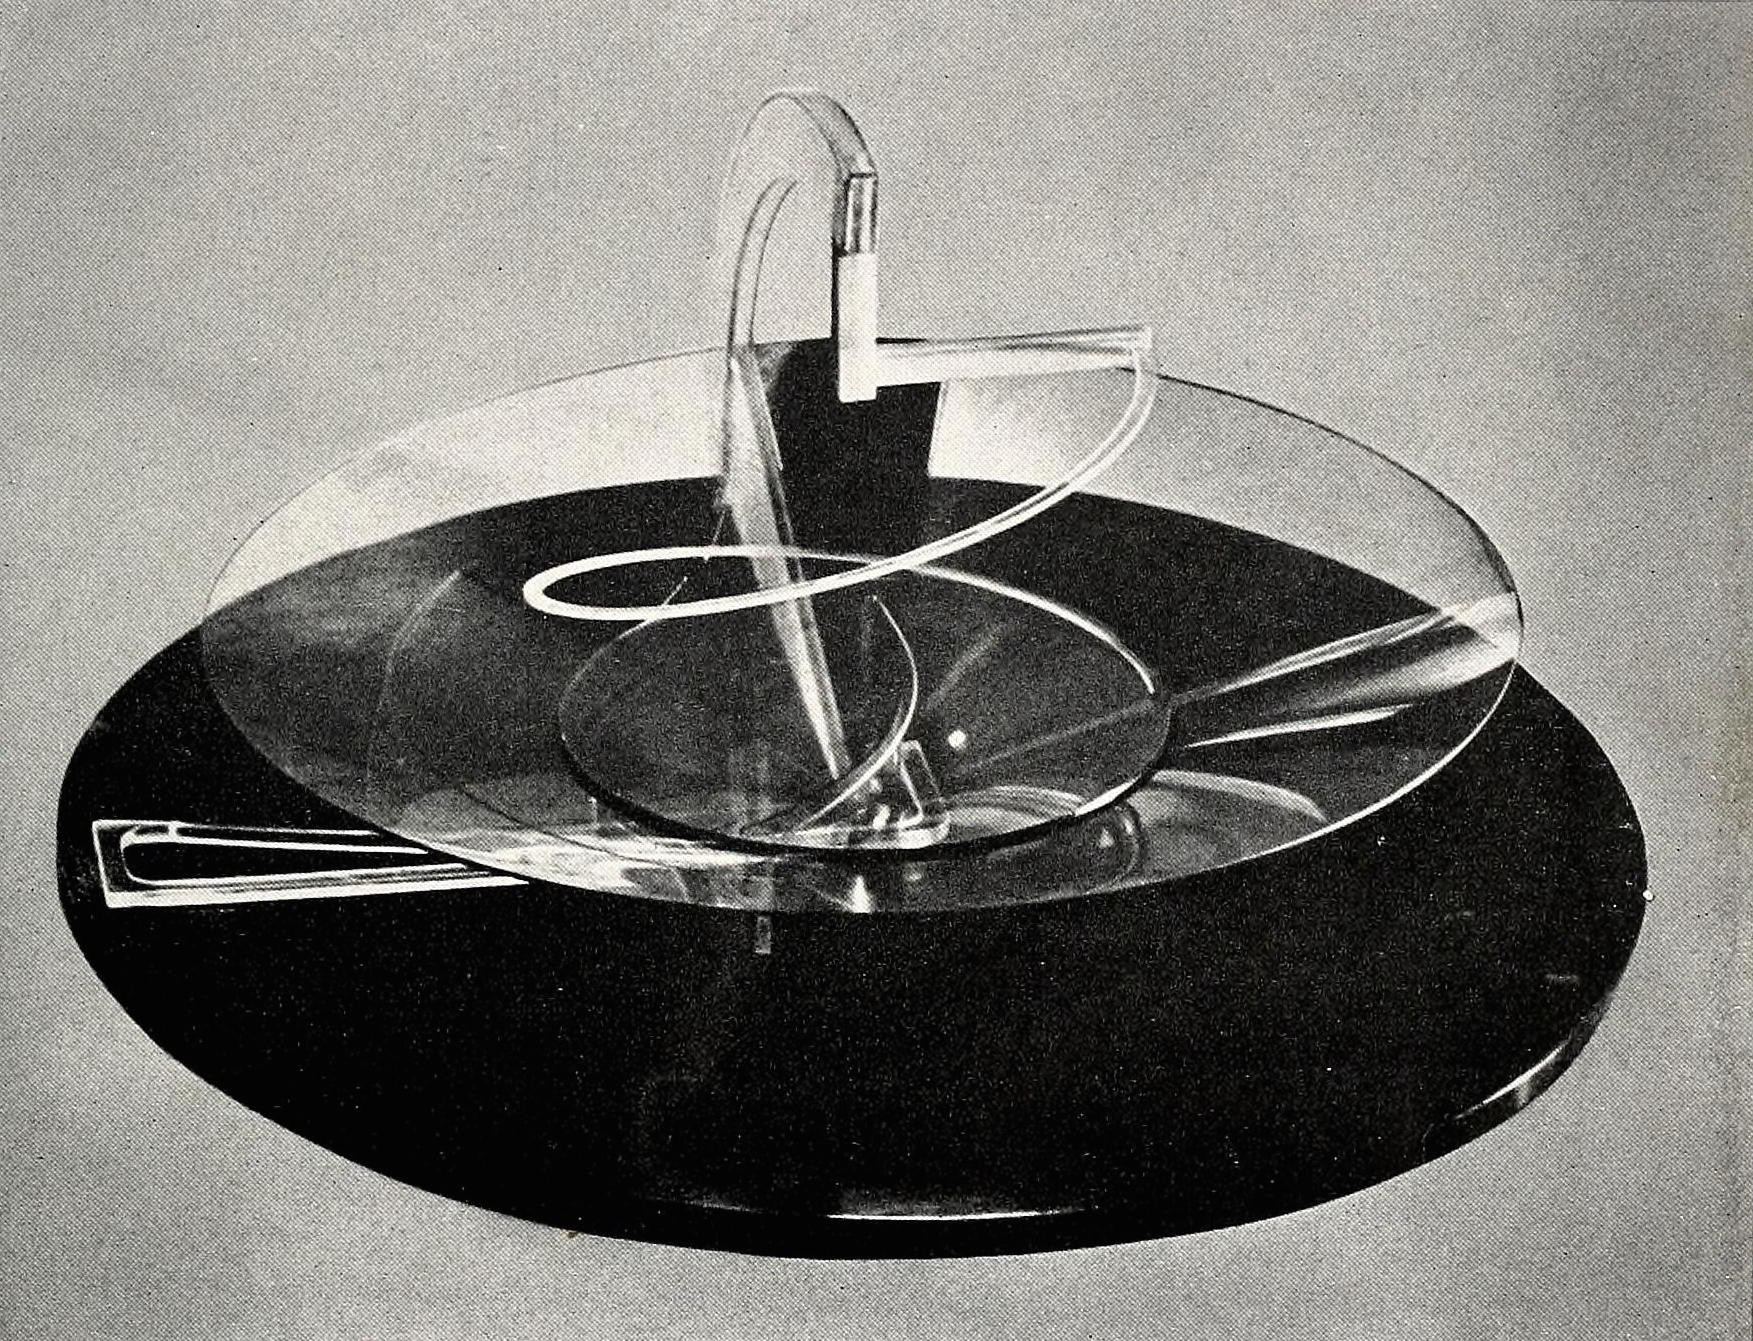 Naum Gabo, Circular relief (1925), plastic on wood 19,5 inch diameter